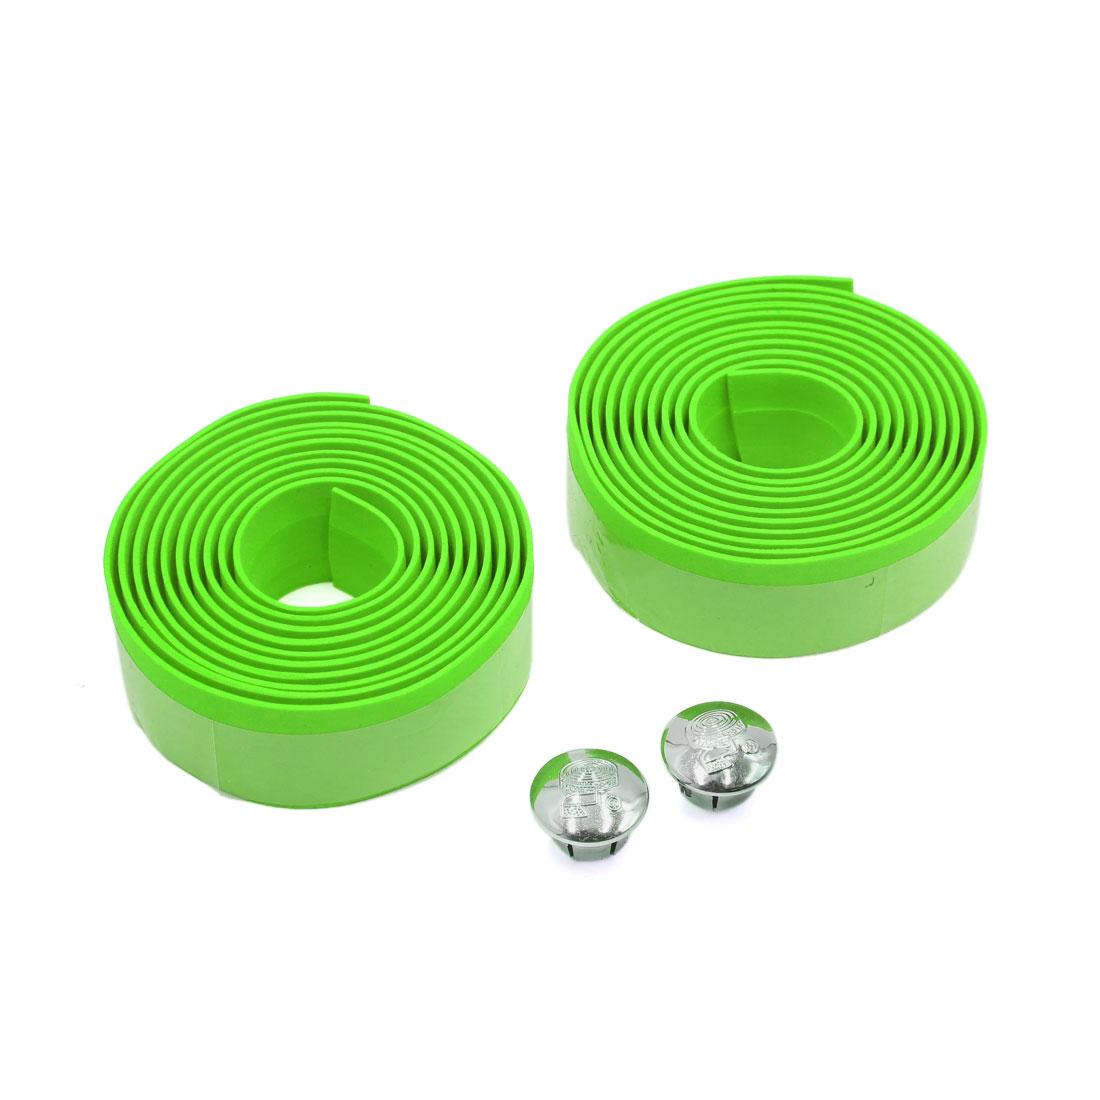 2 Pcs Green Foam Anti Slip Handlebar Tape Bar Grip Wrap for Road Bike Bicycle Cycling